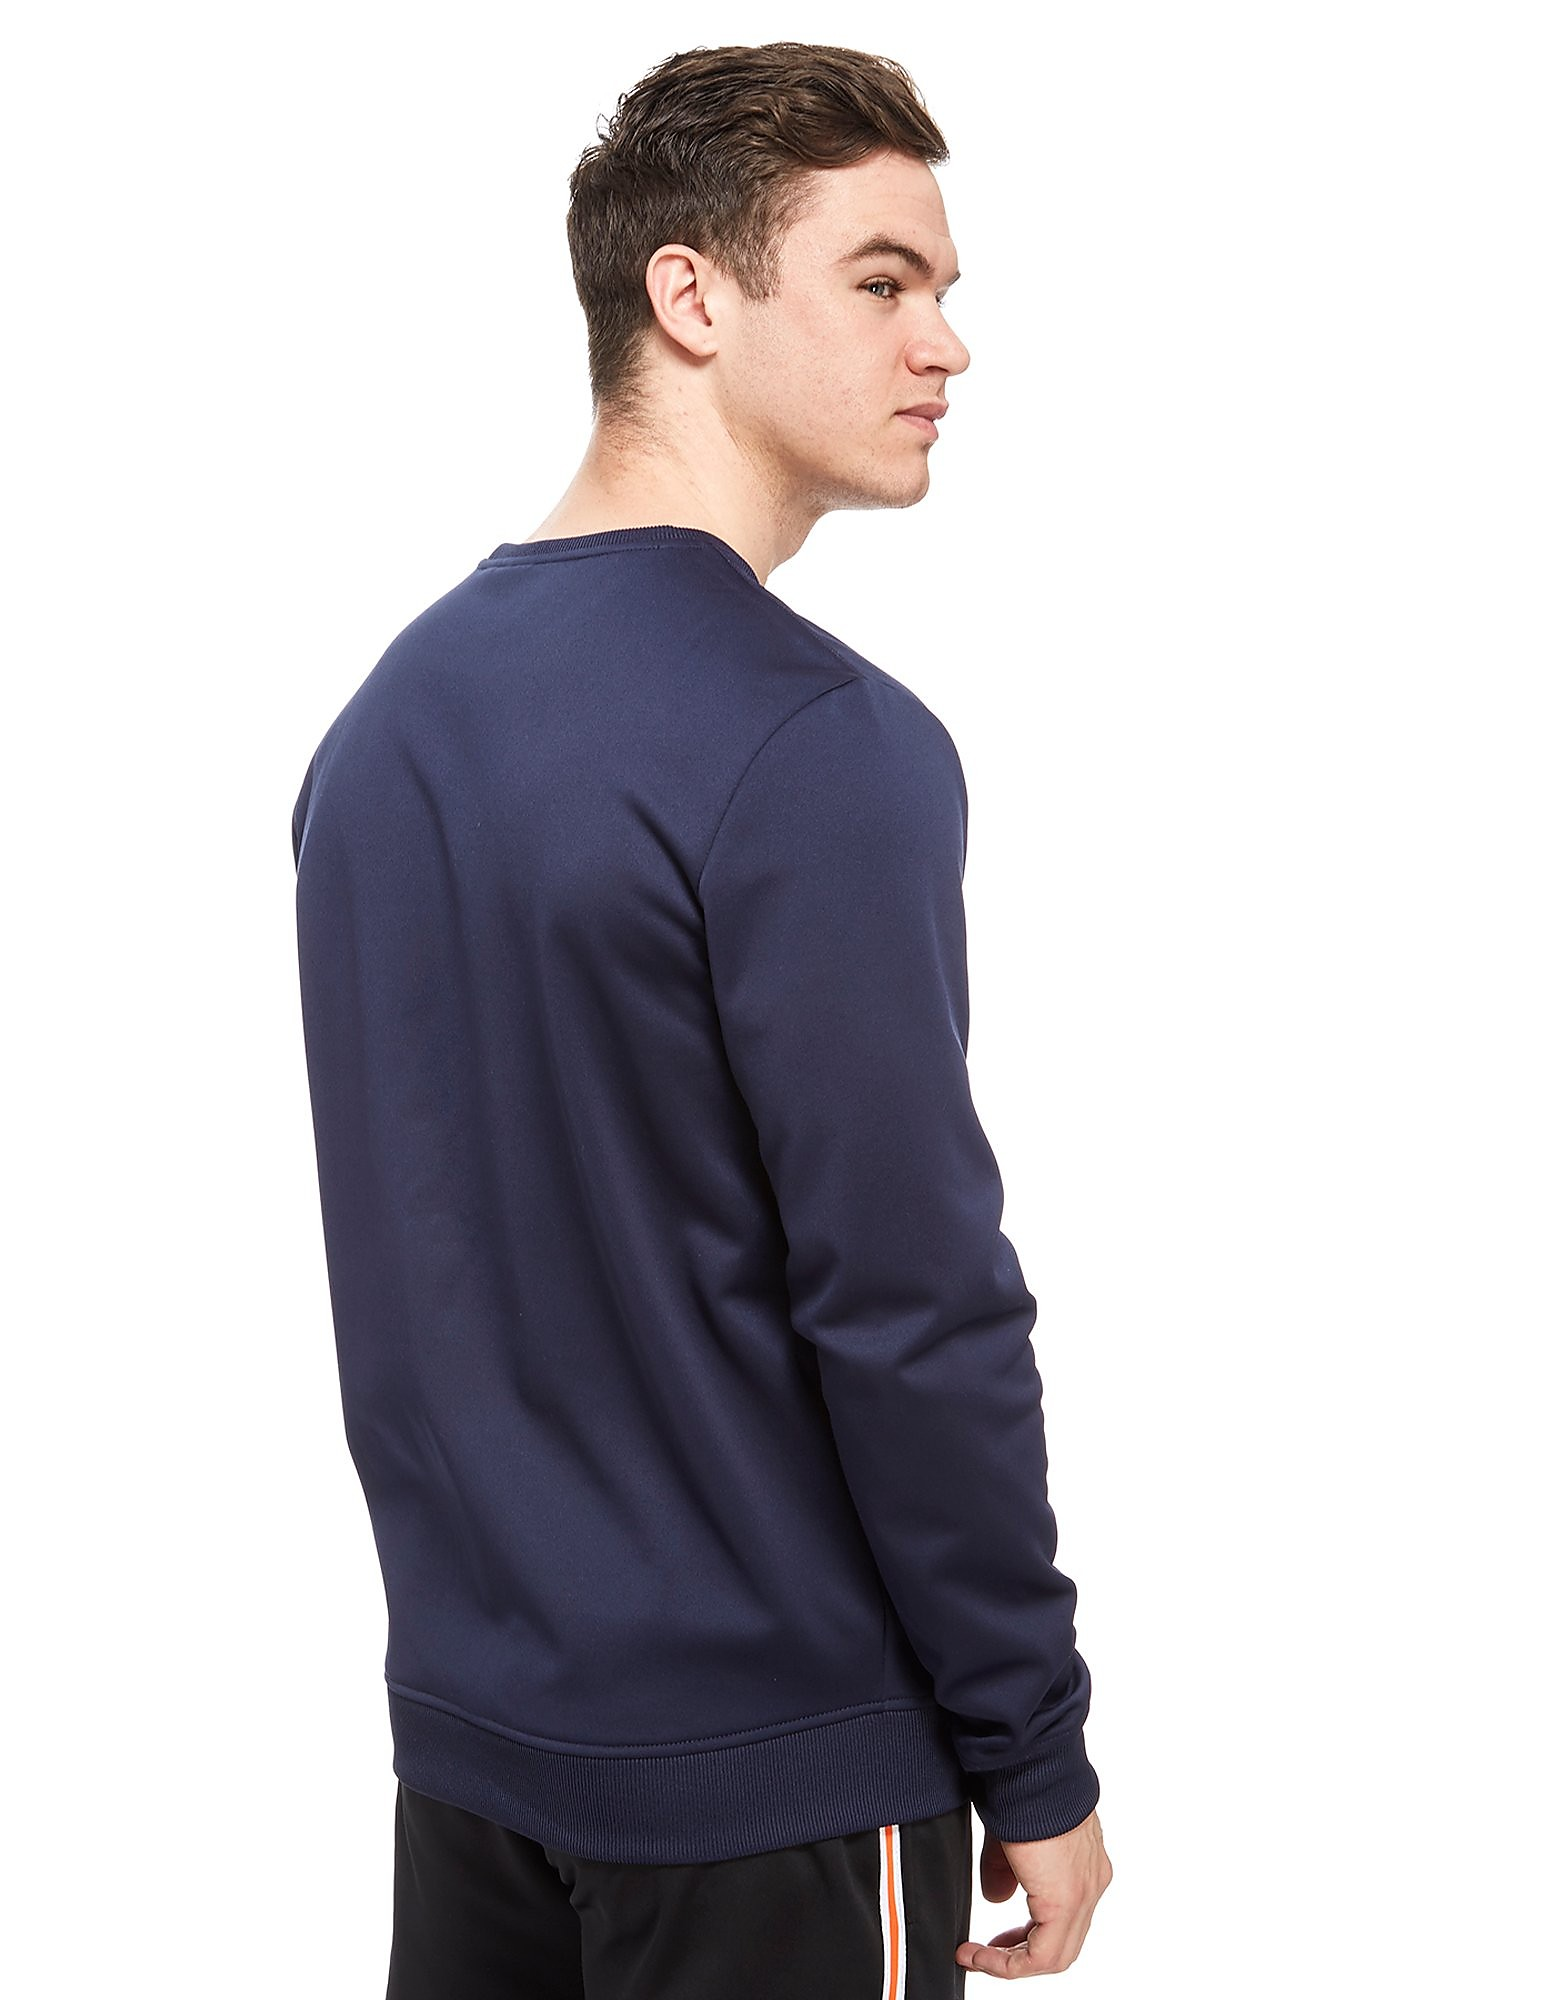 Lyle & Scott Johnson Graphic Crew Sweatshirt